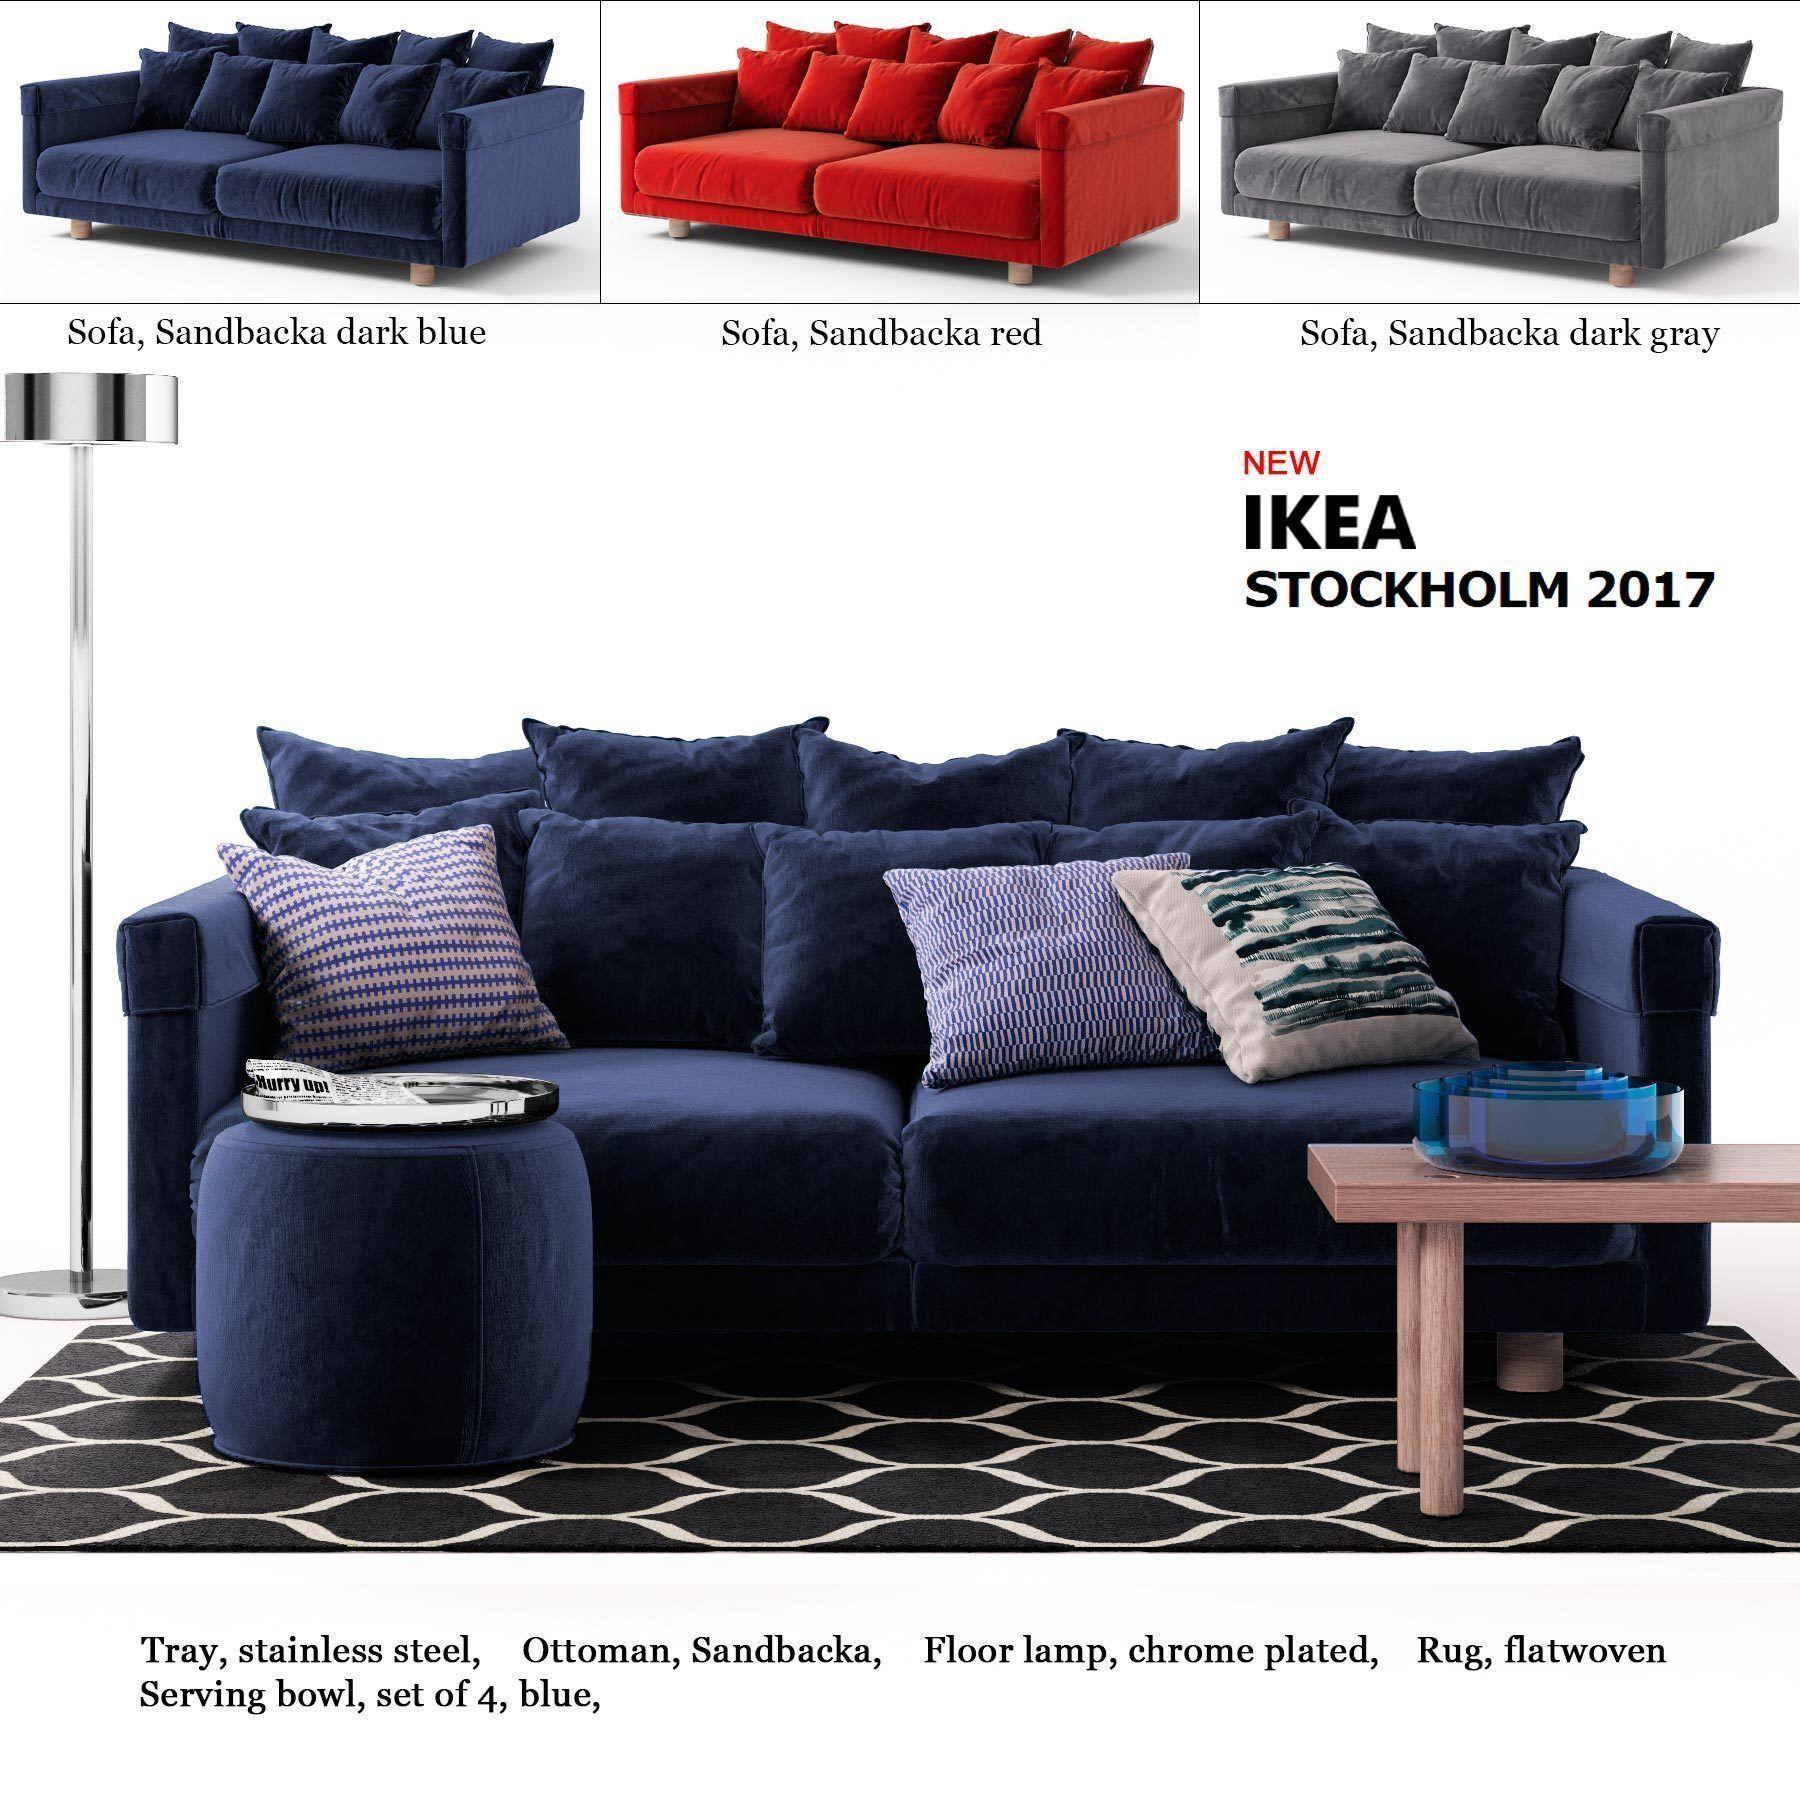 Sofa Ikea Stockholm 2017 Model